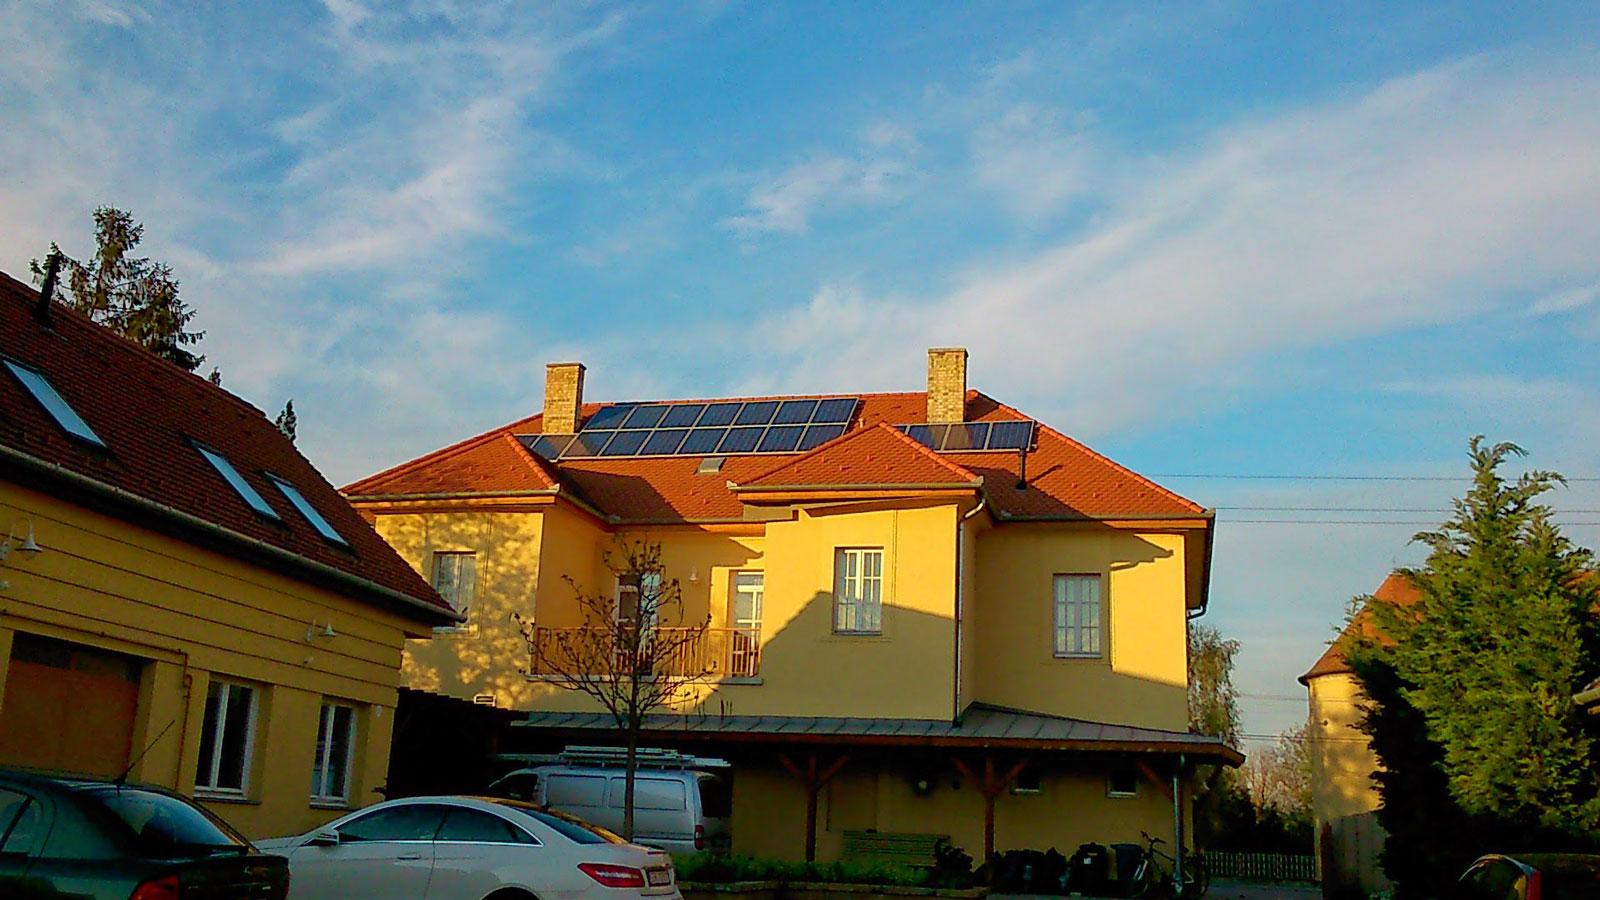 Napelem Pest megye, napelem Budapest, napelem rendszer